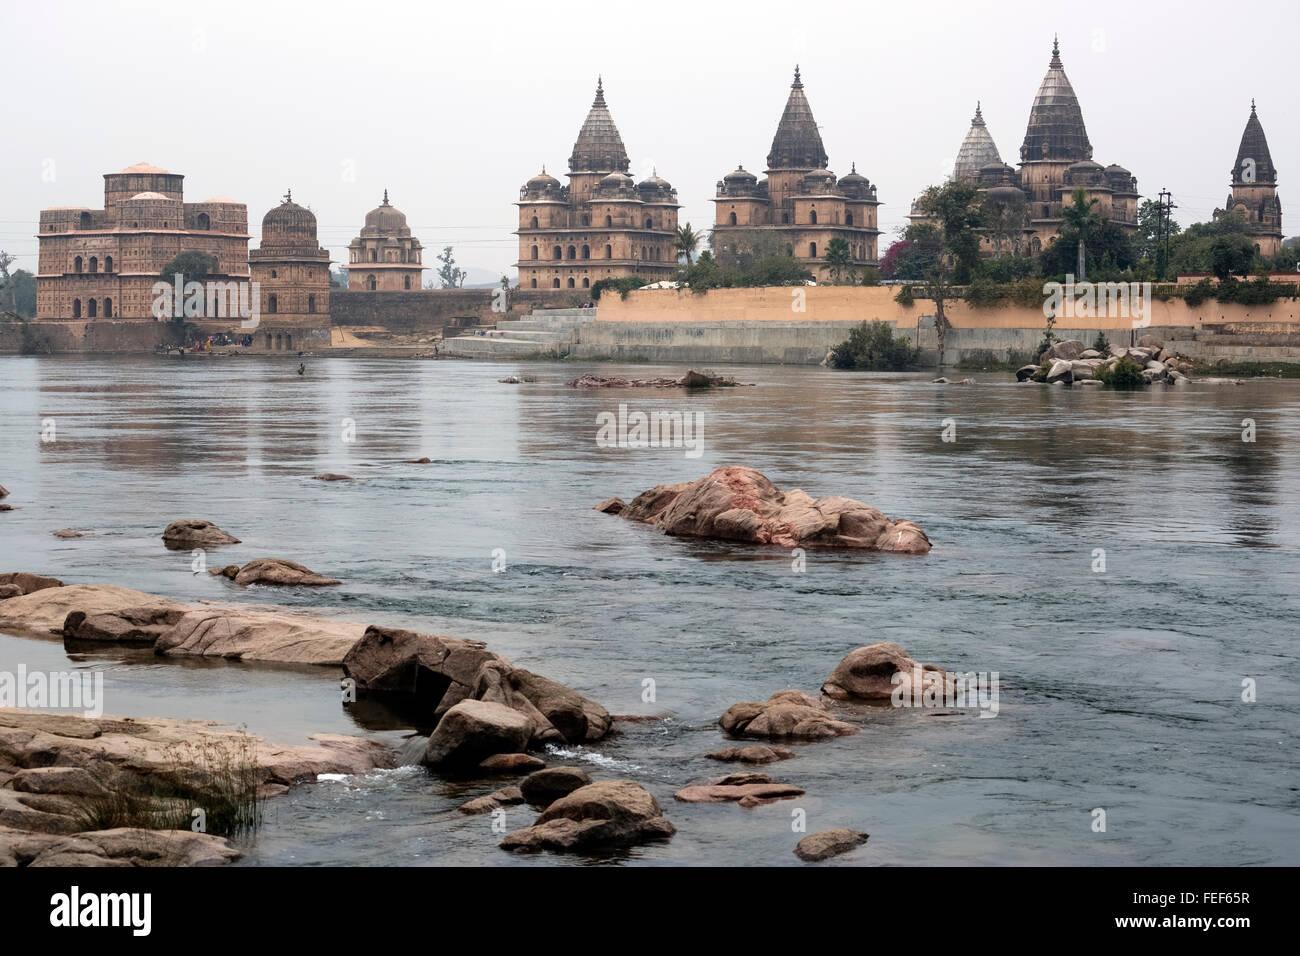 Cenotaphs, Orchha, Madhya Pradesh, India, South Asia - Stock Image